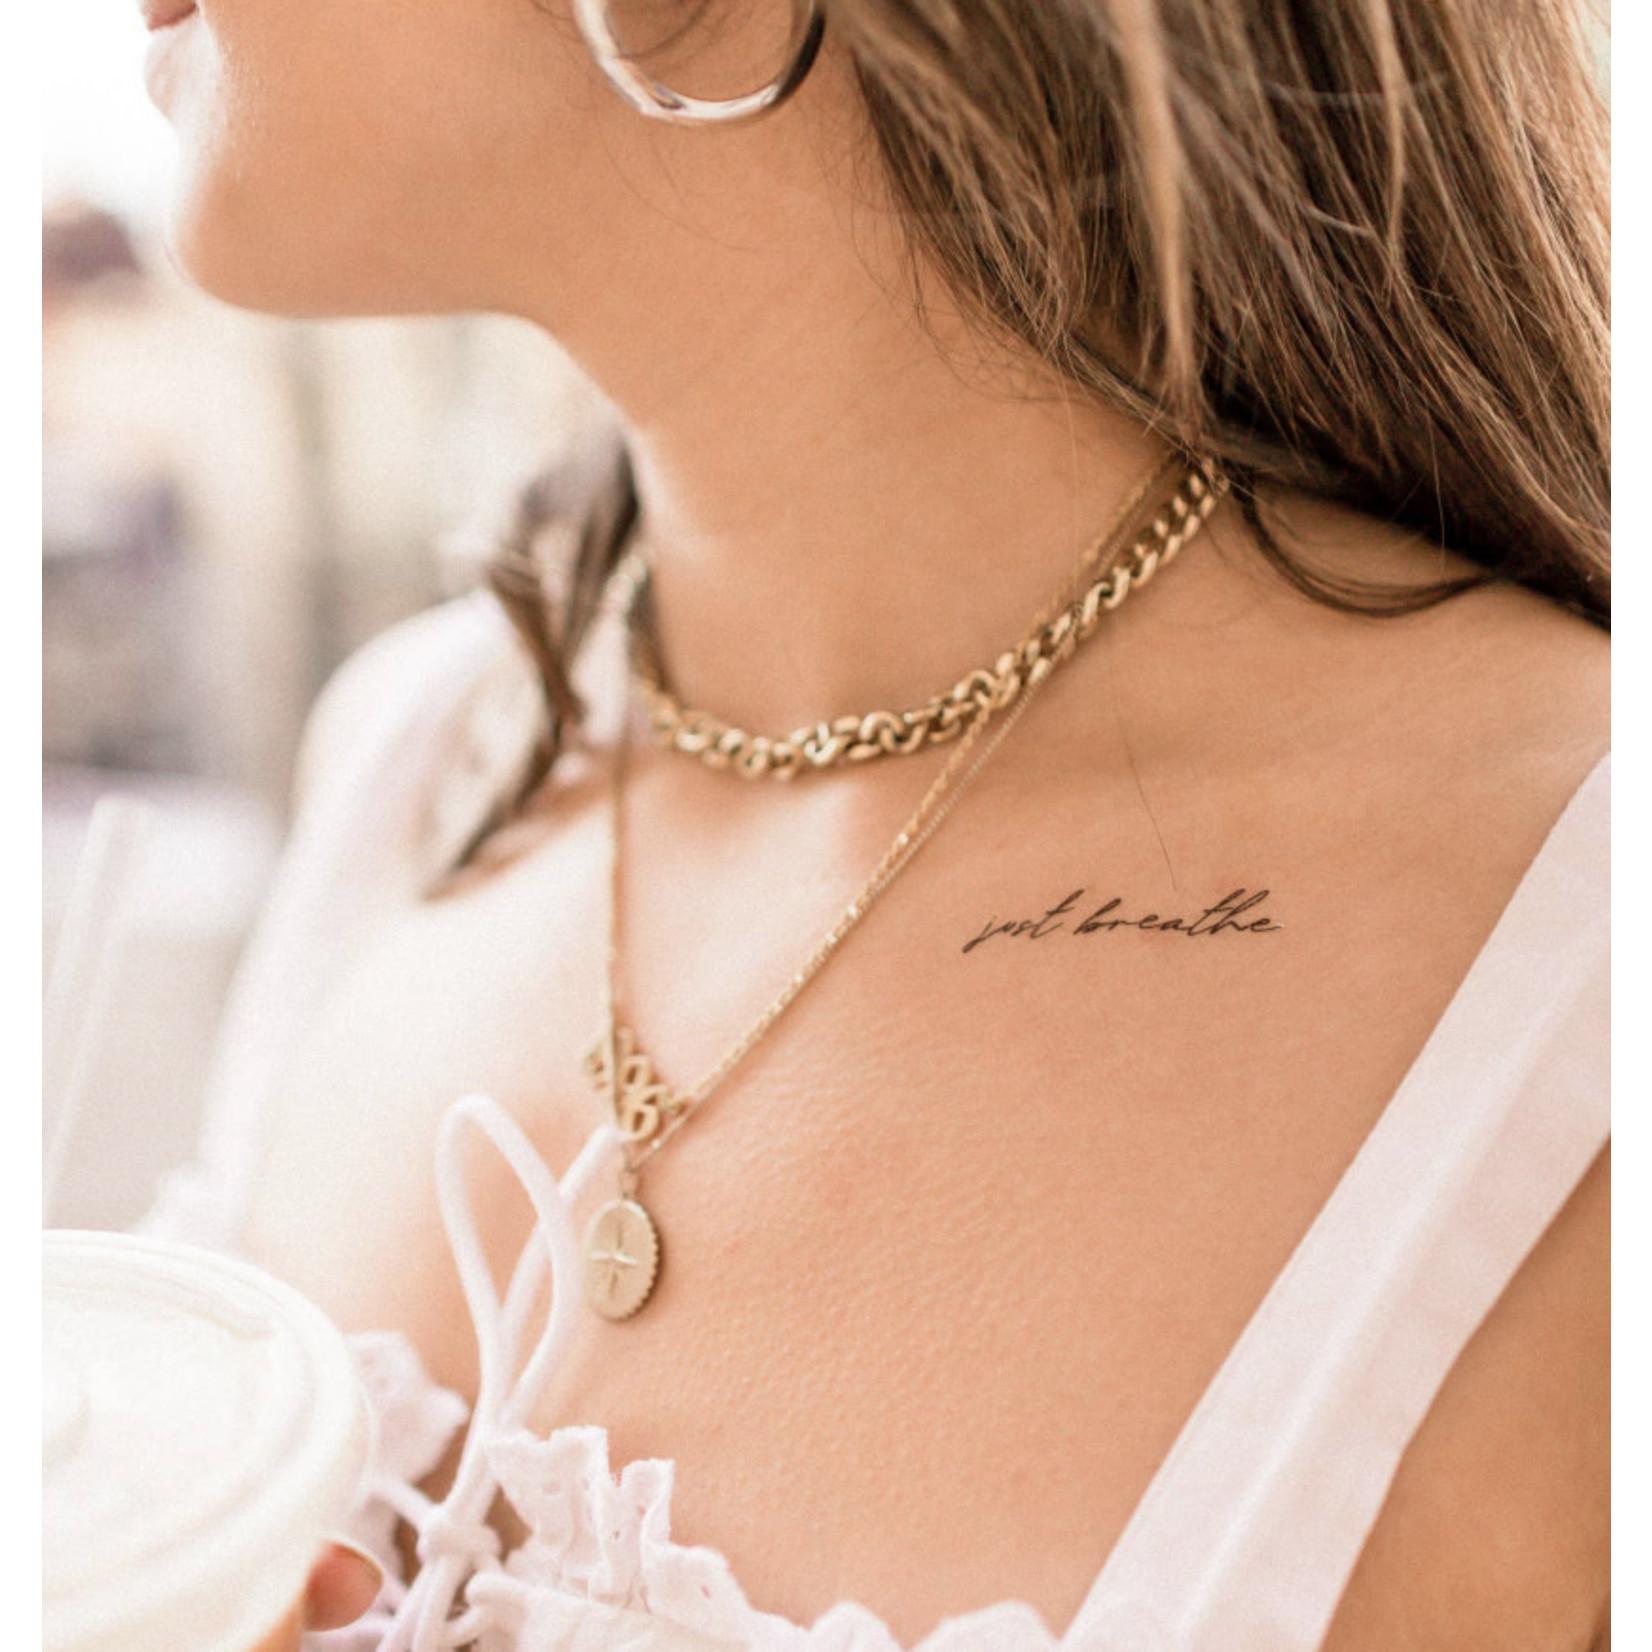 Inked by Dani INKED Tempory tattoo pack- Self Love